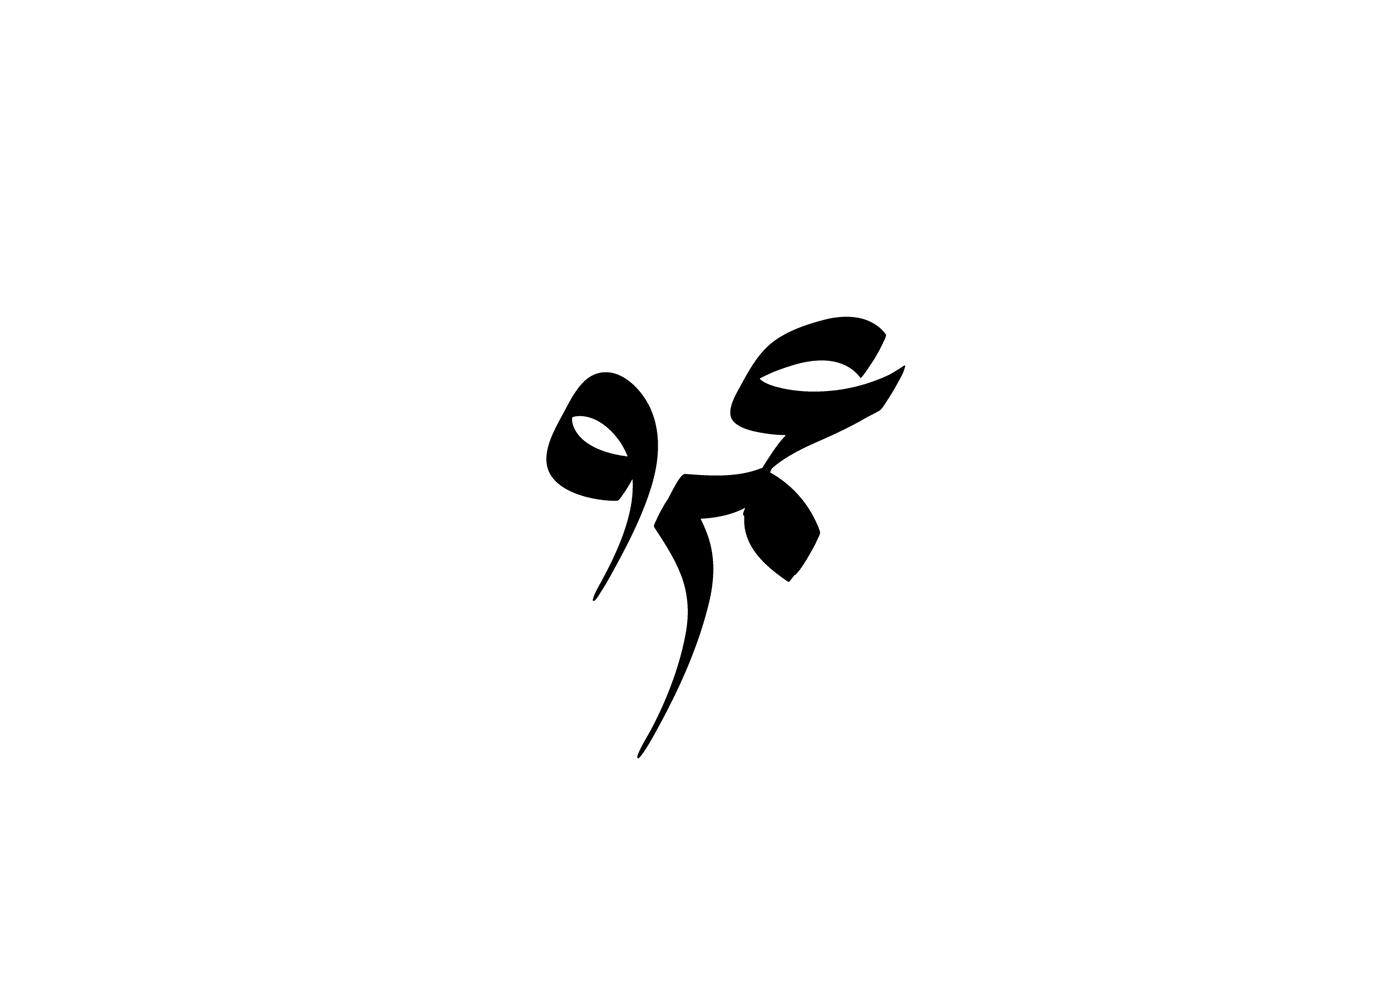 Amazing Typography Arabic Names Sonboly Font 3 On Behance